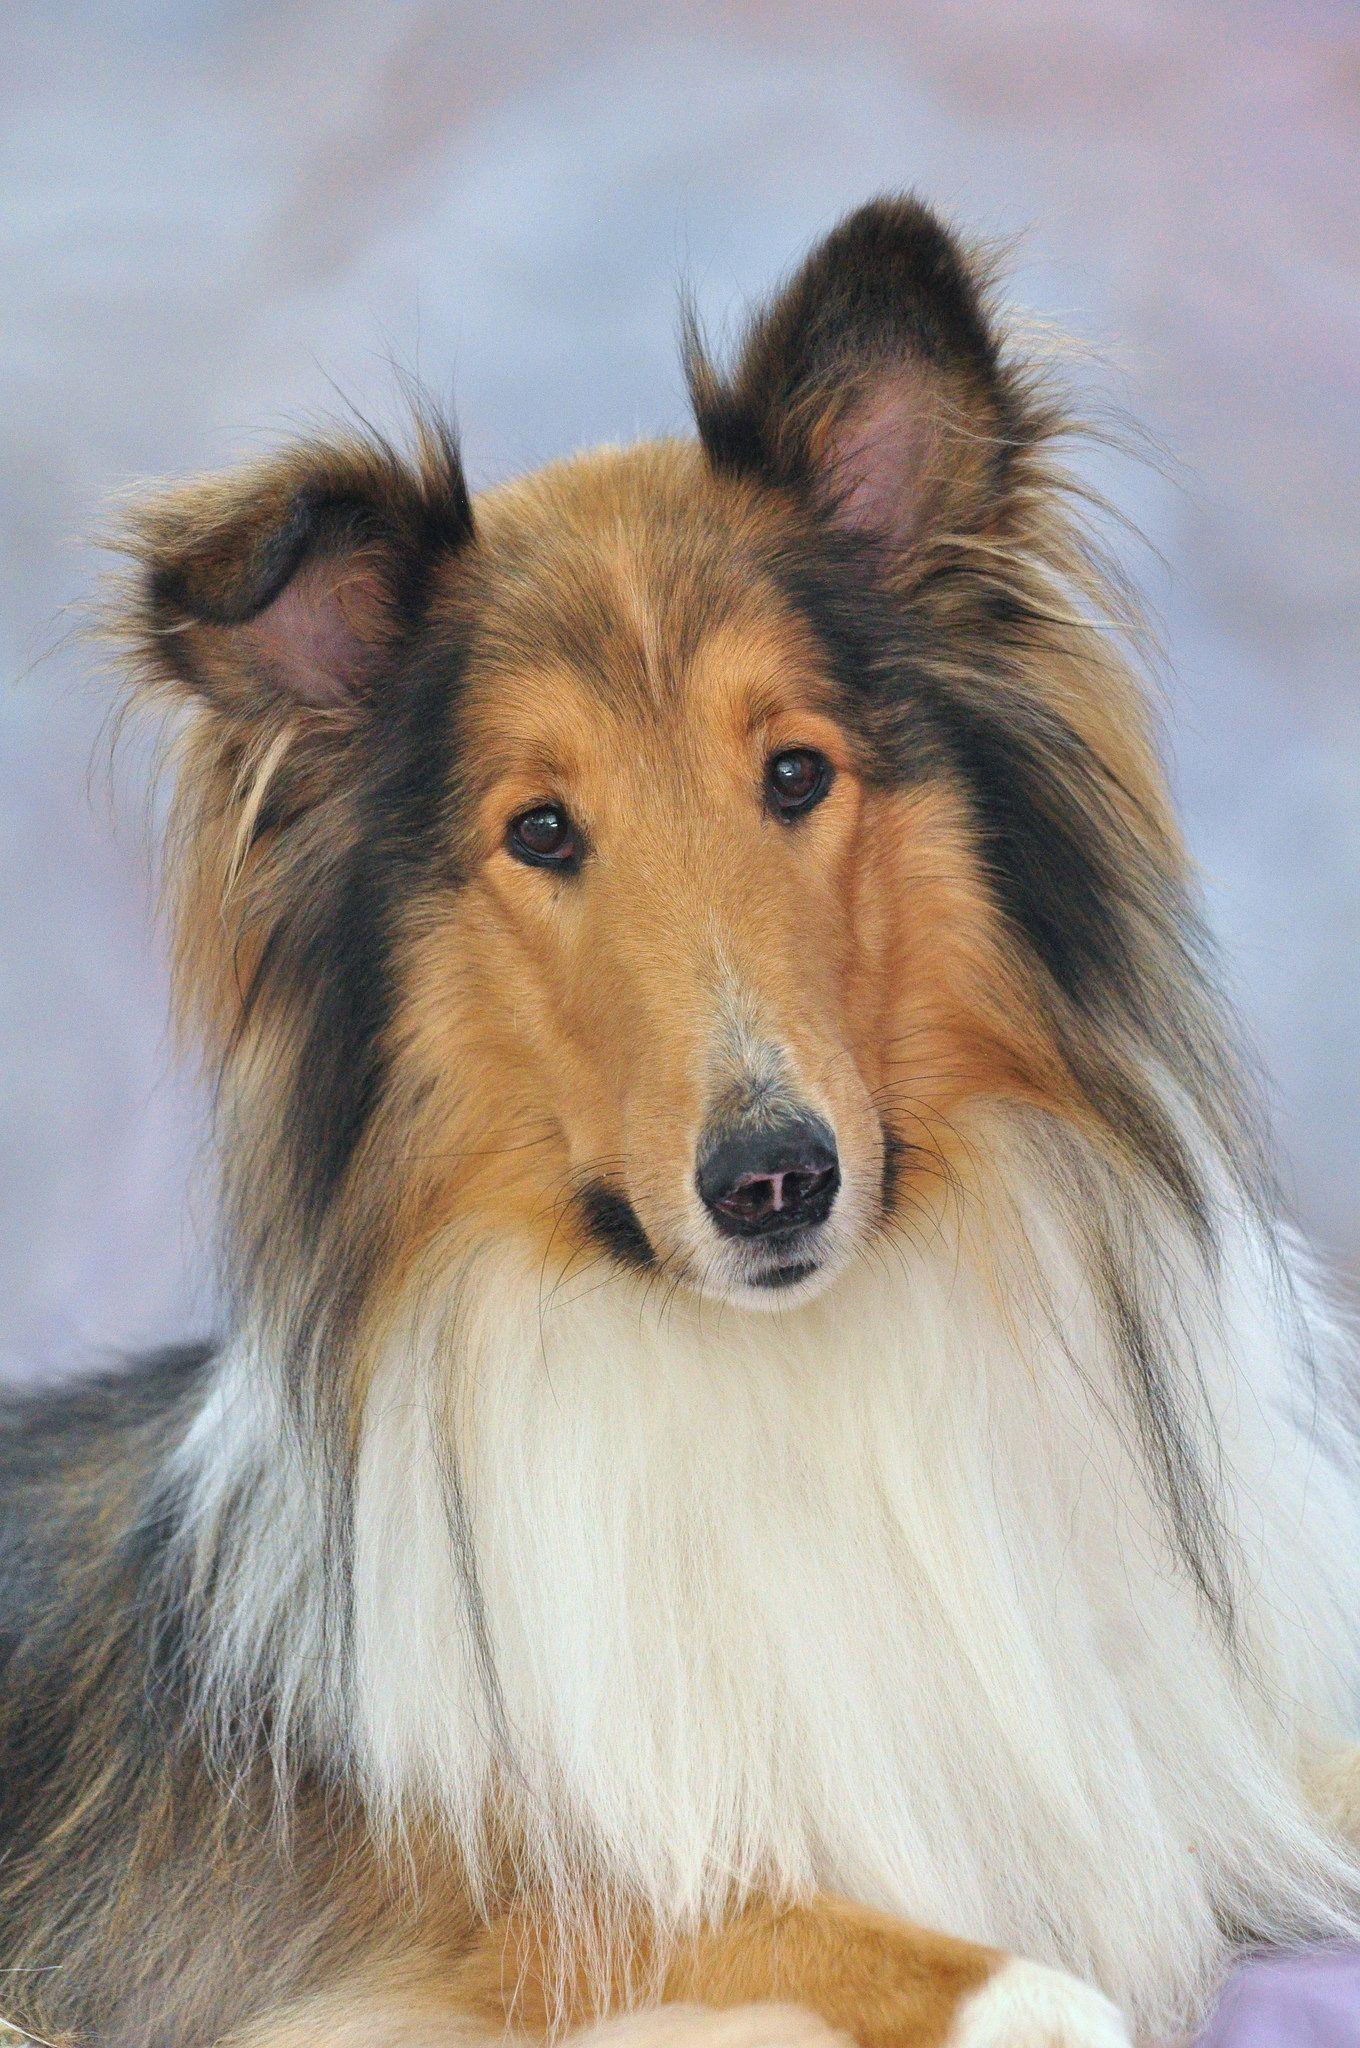 My friends Rough Collie Eli _0136 Rough collie, Dogs, Collie